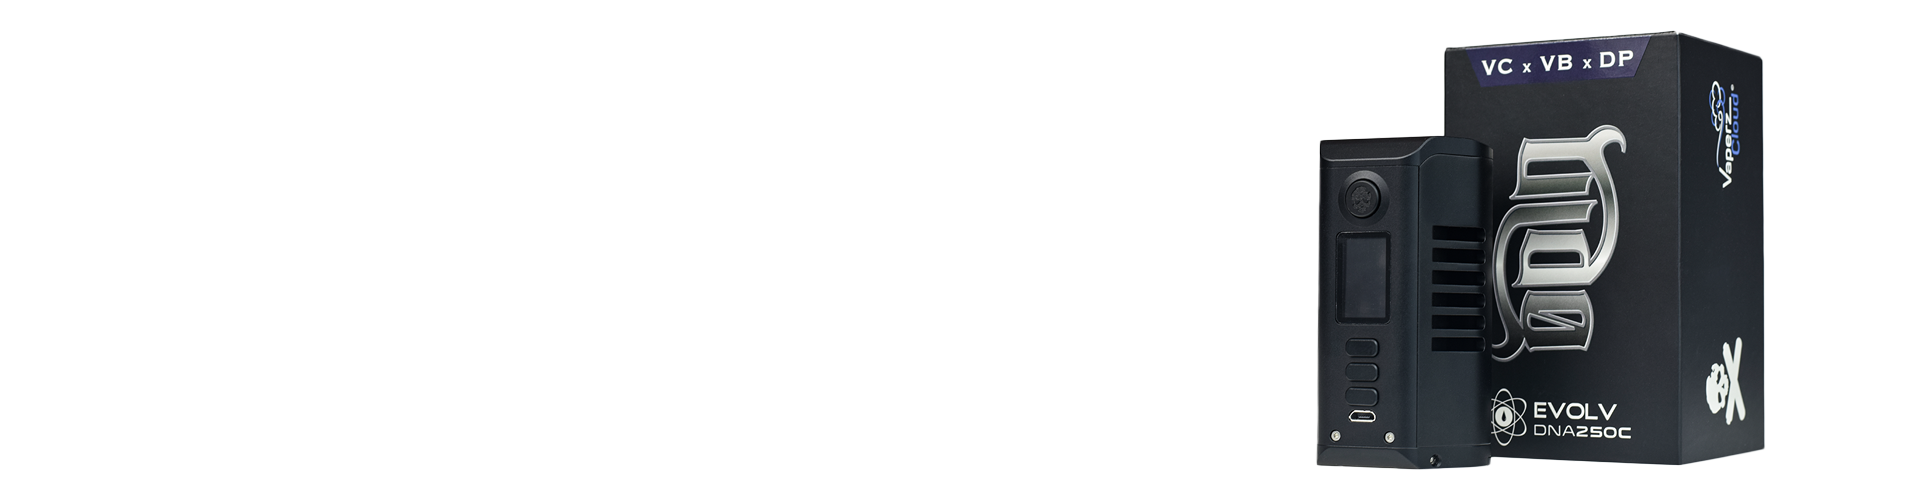 Odin DNA250c Mod